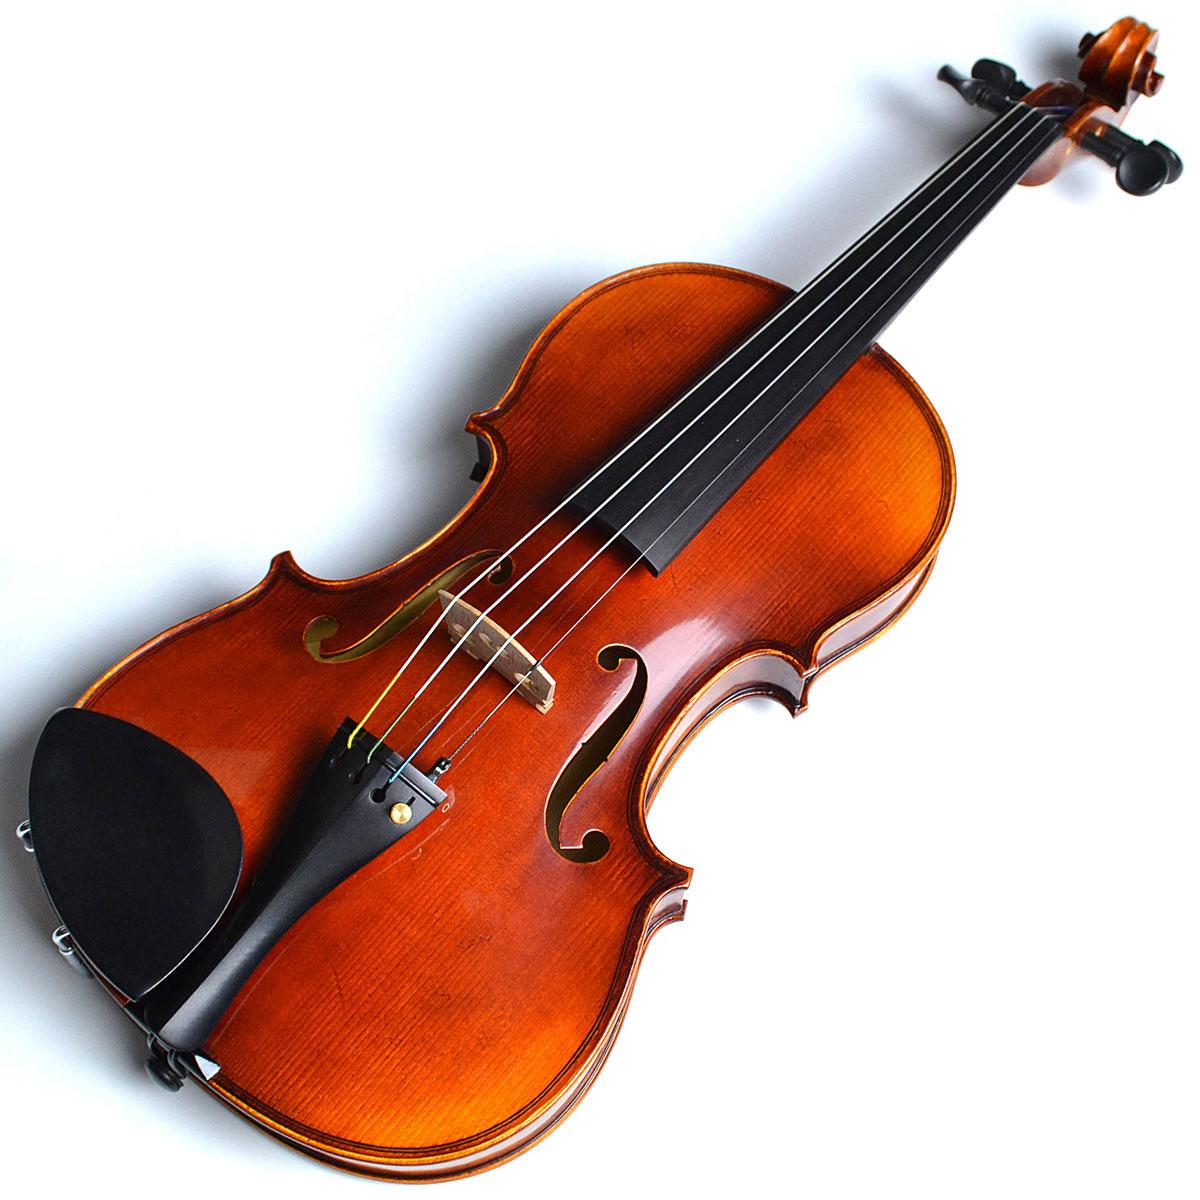 GEWA Meister II バイオリン セット 4/4サイズ ケースカラー:ブラウン 【ゲバ マイスター II アウトフィット】【島村楽器限定】